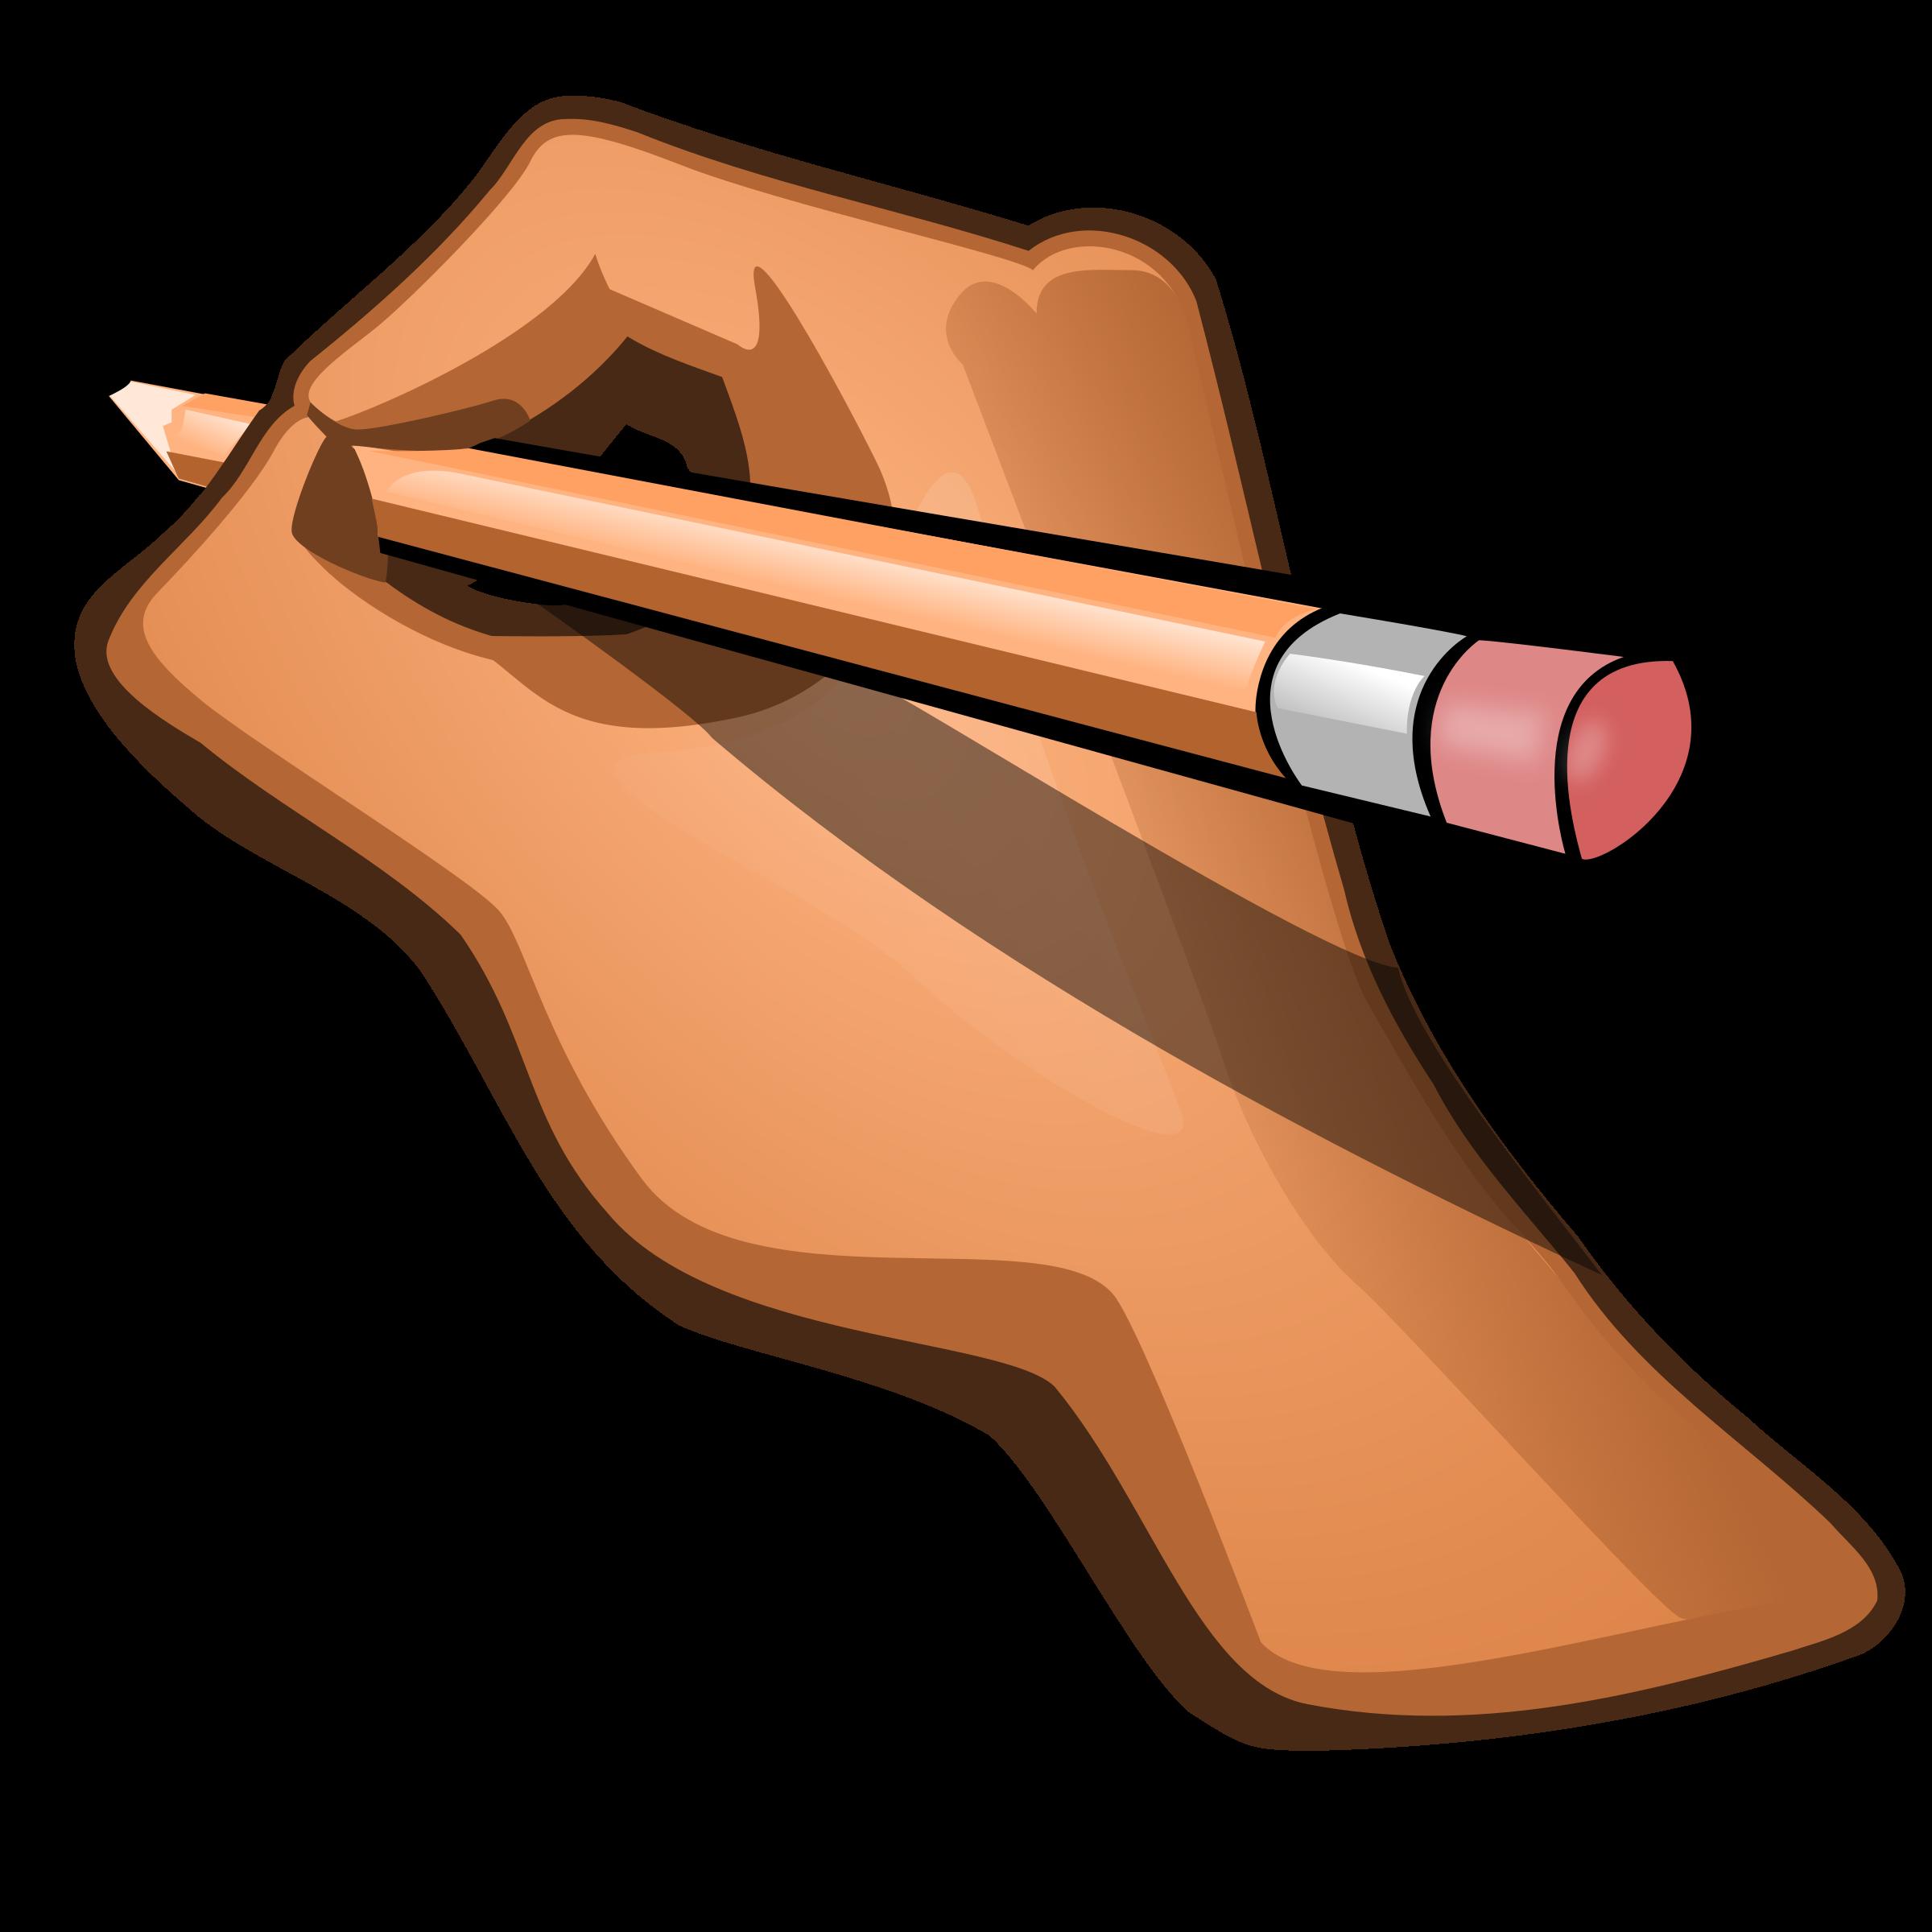 Money fine clipart royalty free library hand-pencil.png (2400×2400) | Desktop wallpapers | Pinterest | Wallpaper royalty free library